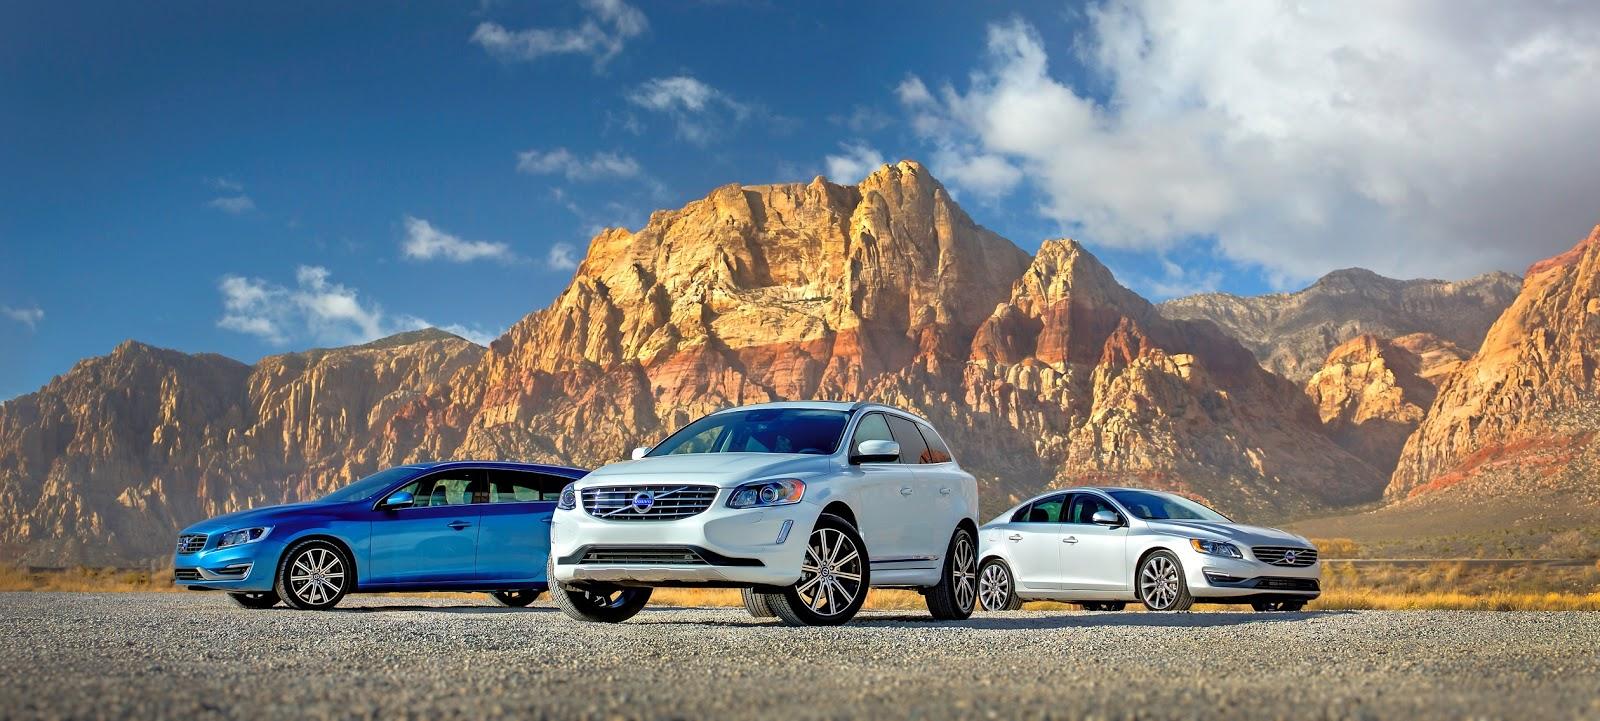 VOLVO S60 V60 XC60 Εν μέσω κρίσης η Volvo χτυπάει κορυφή Volvo S60, Volvo V40, Volvo V40 Cross Country, Volvo V60, Volvo XC60, Volvo XC90